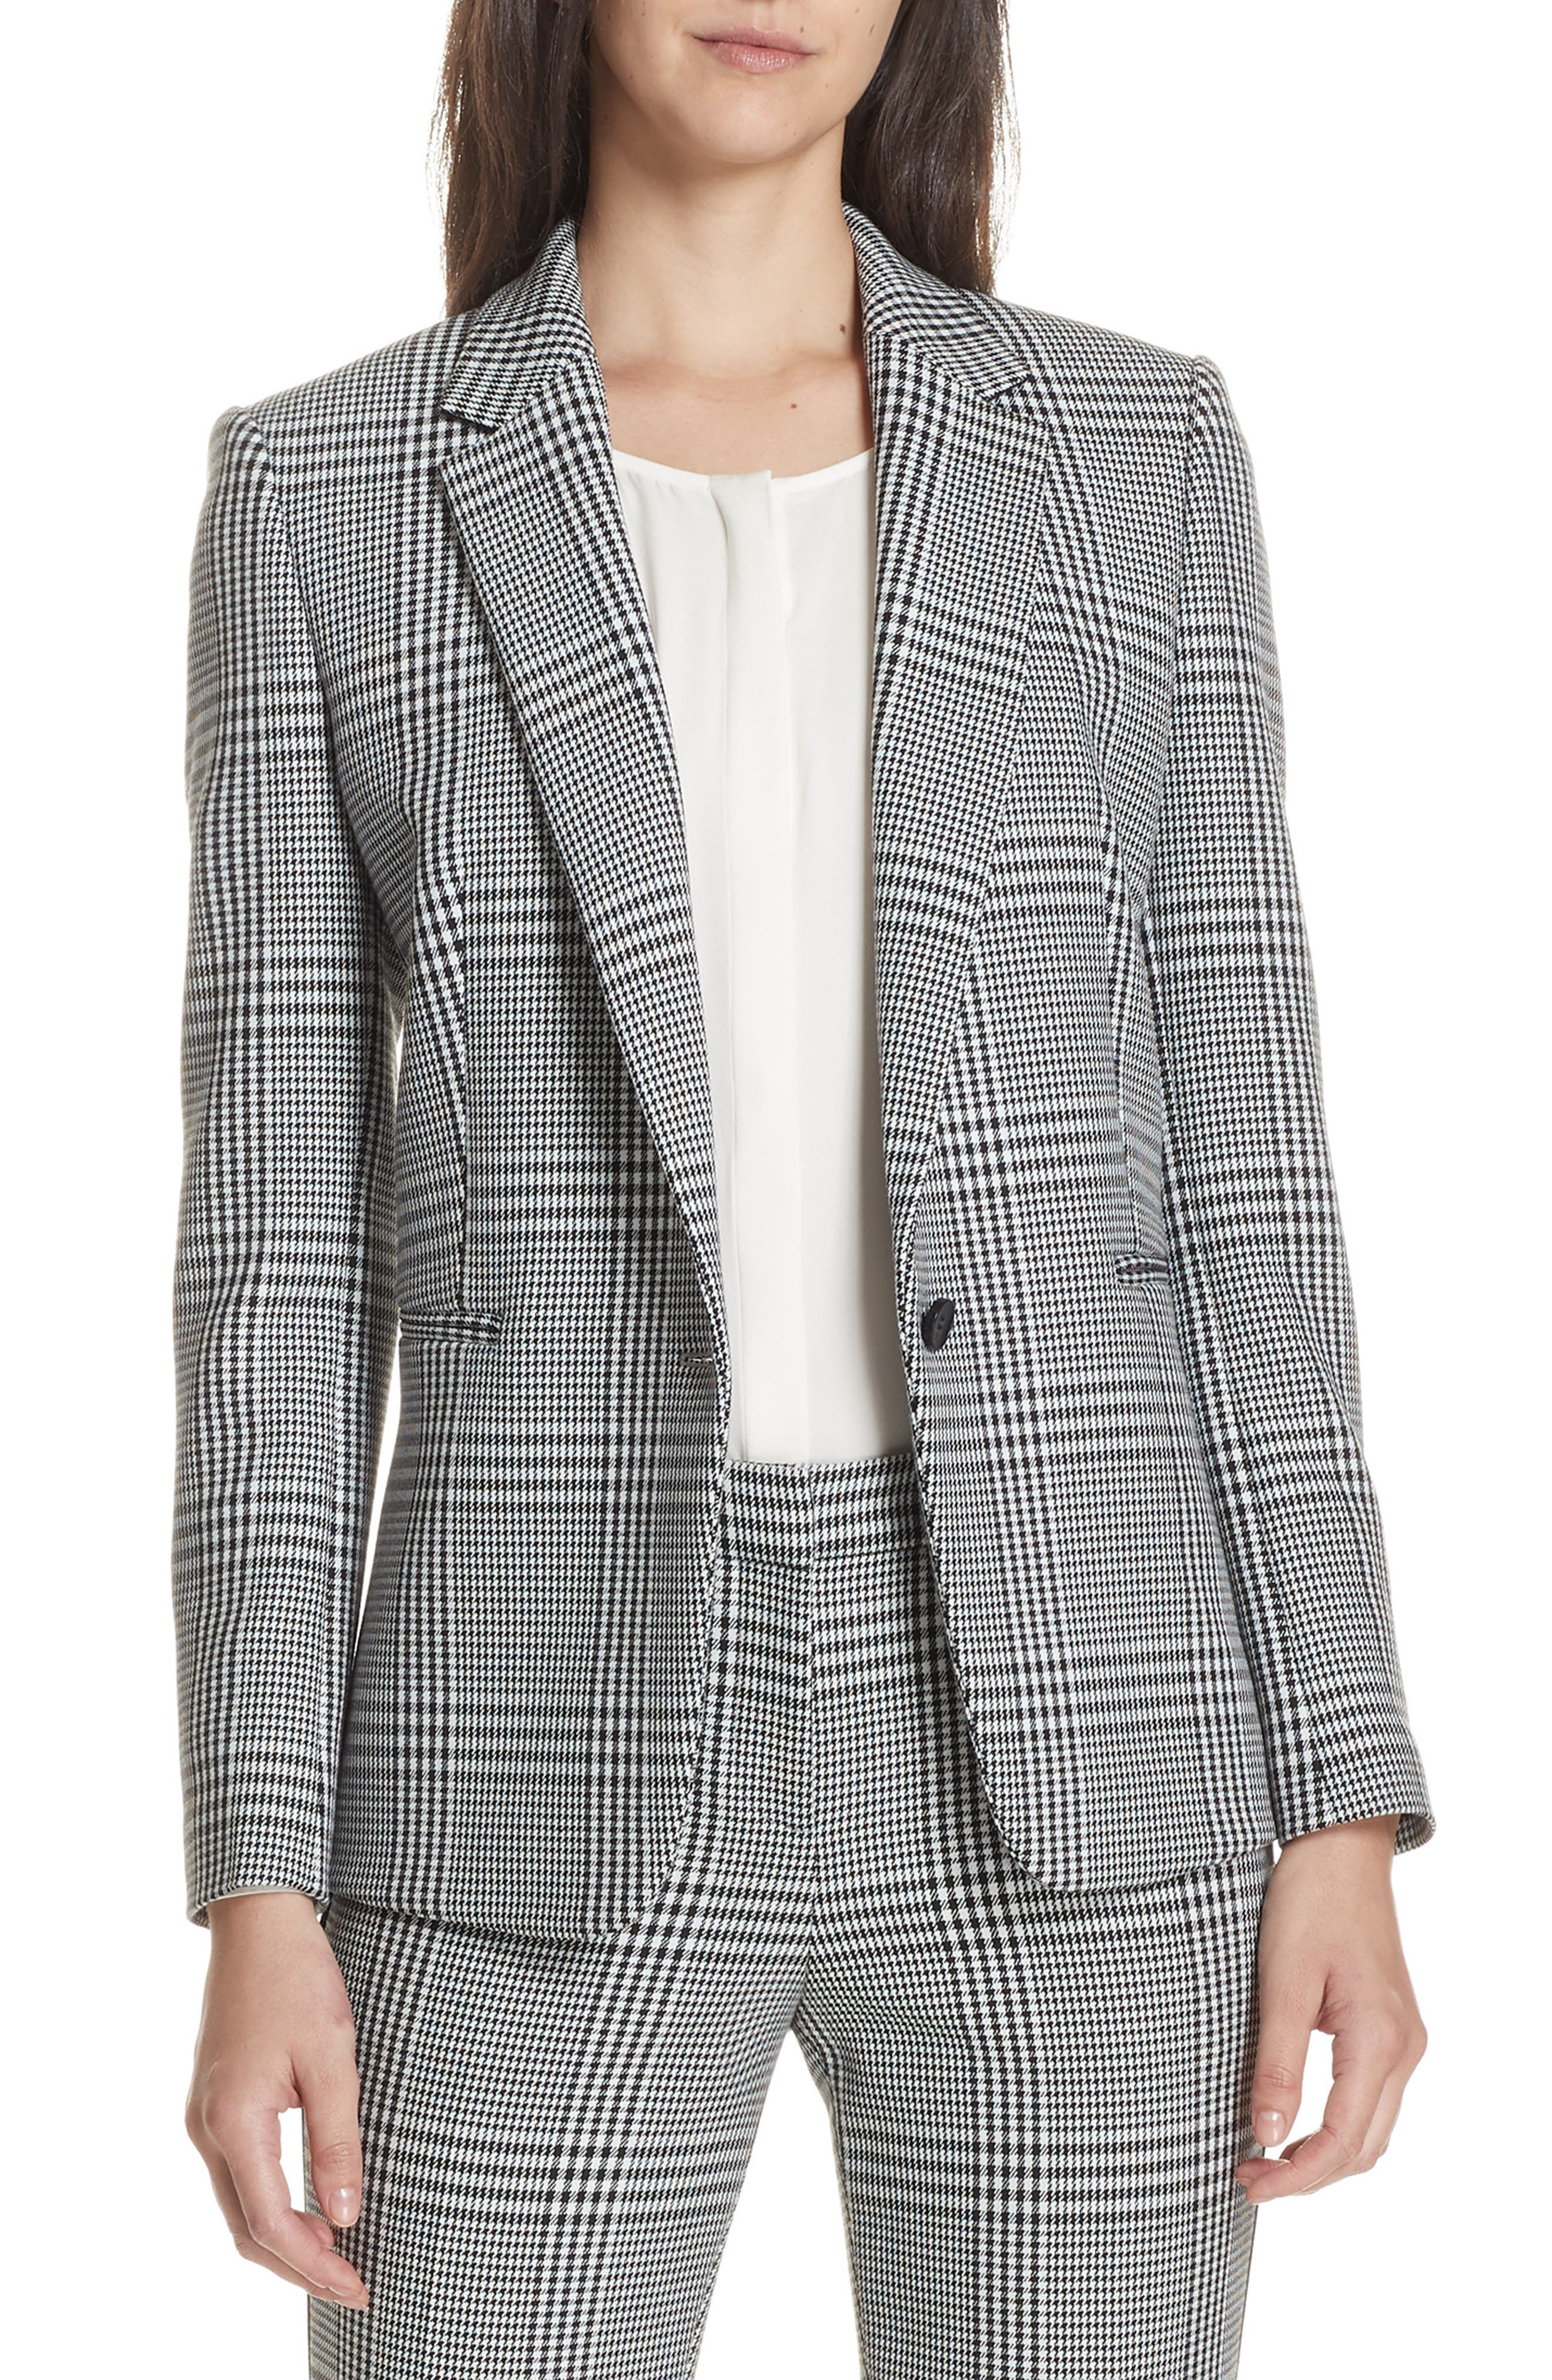 Jemaromina Glen Plaid Suit Jacket,                             Main thumbnail 1, color,                             020